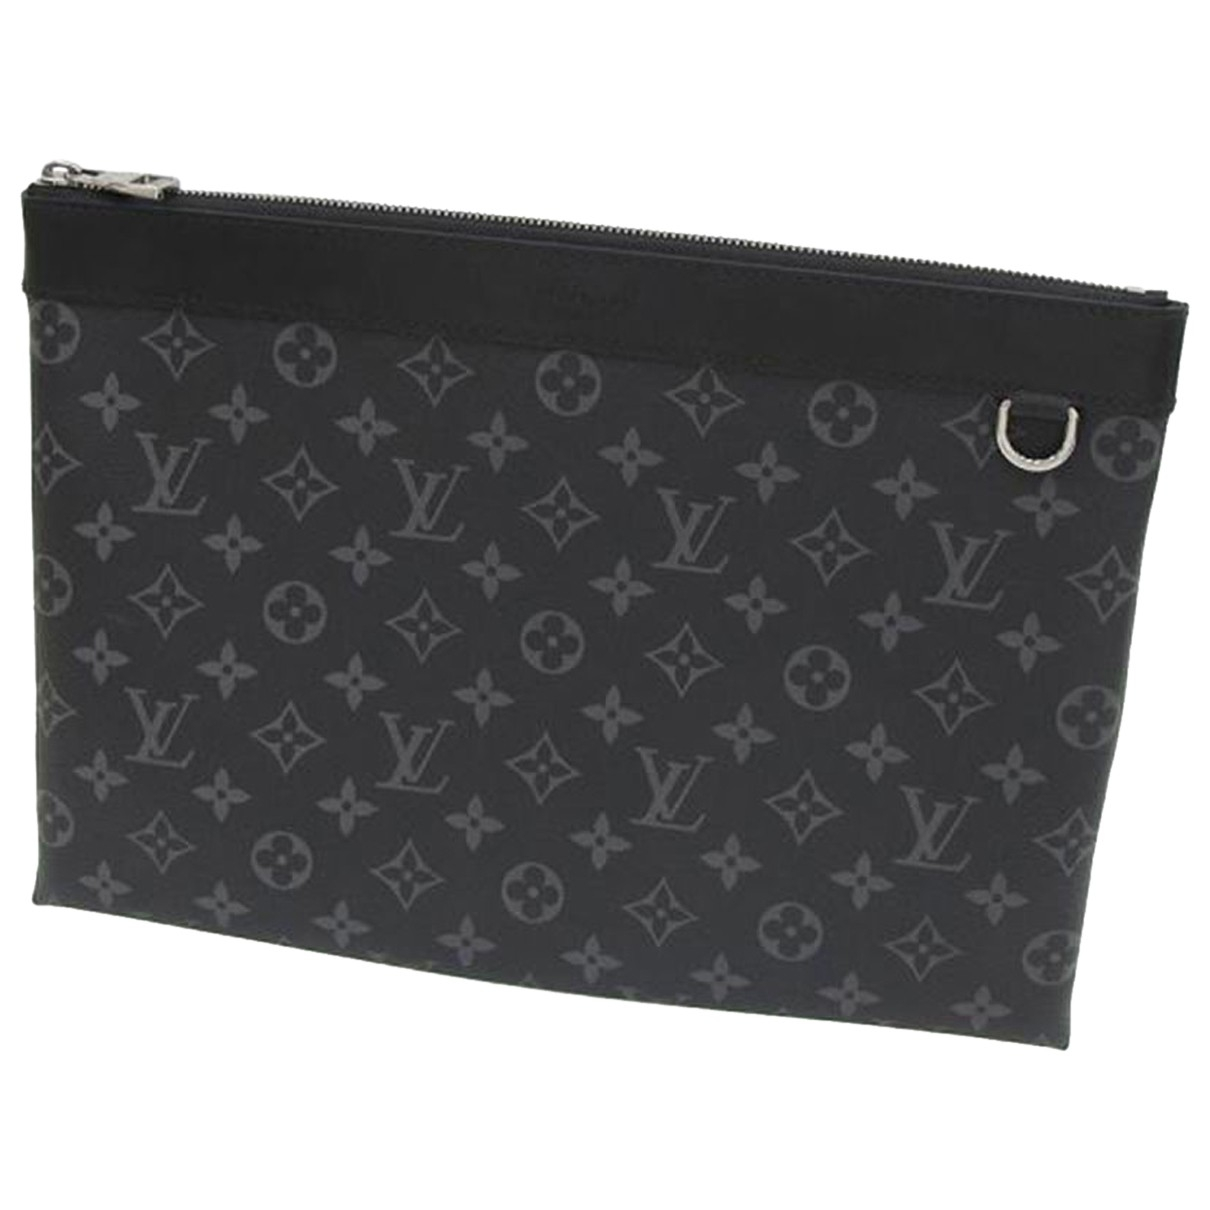 Louis Vuitton N Black Leather Purses, wallet & cases for Women N